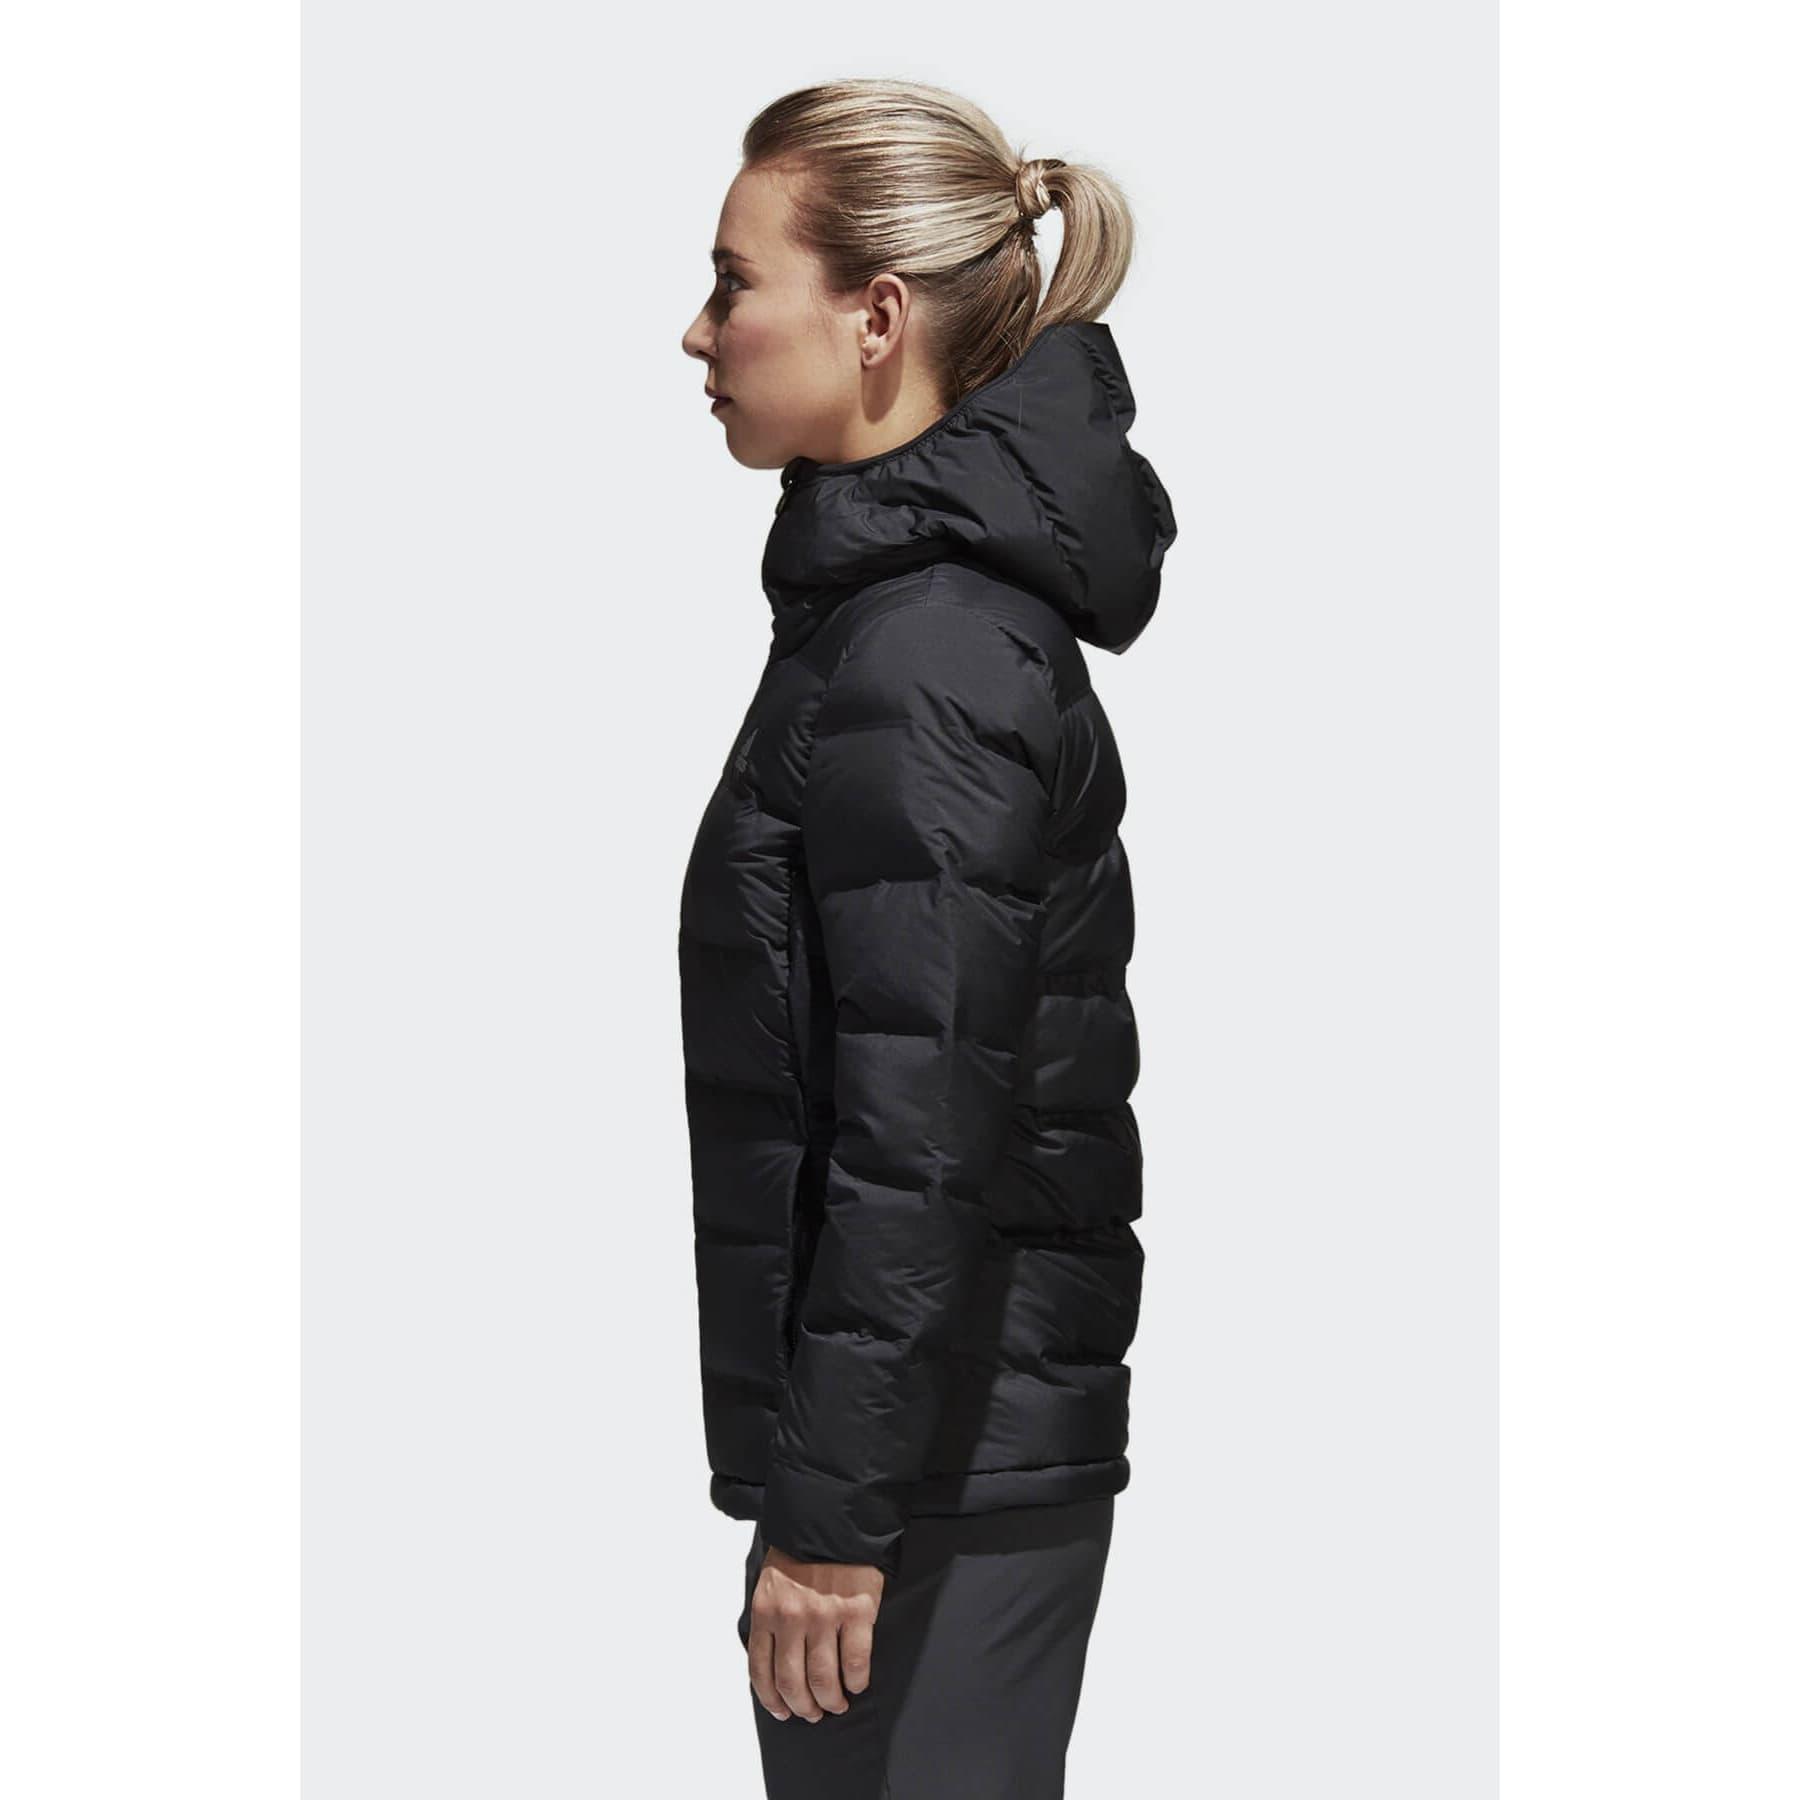 adidas Helionic Kadın Siyah Dolgulu Mont